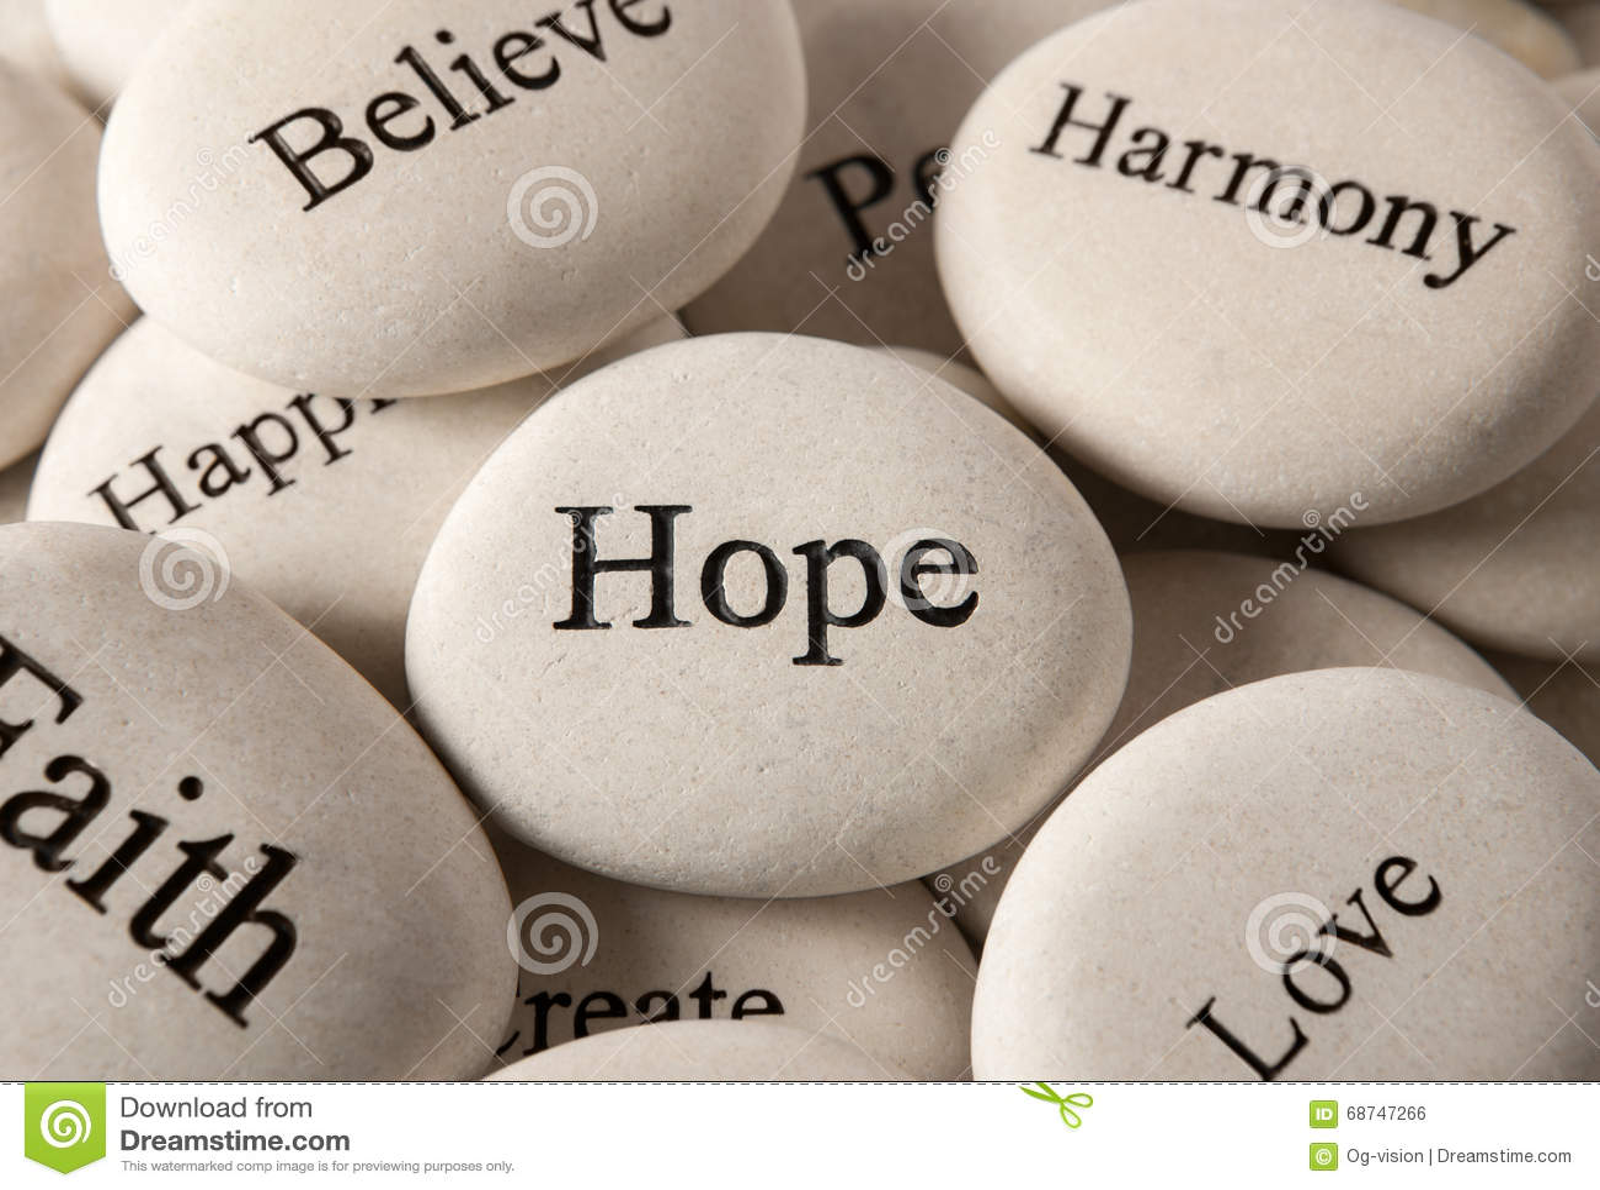 Inspirational stones - Hope